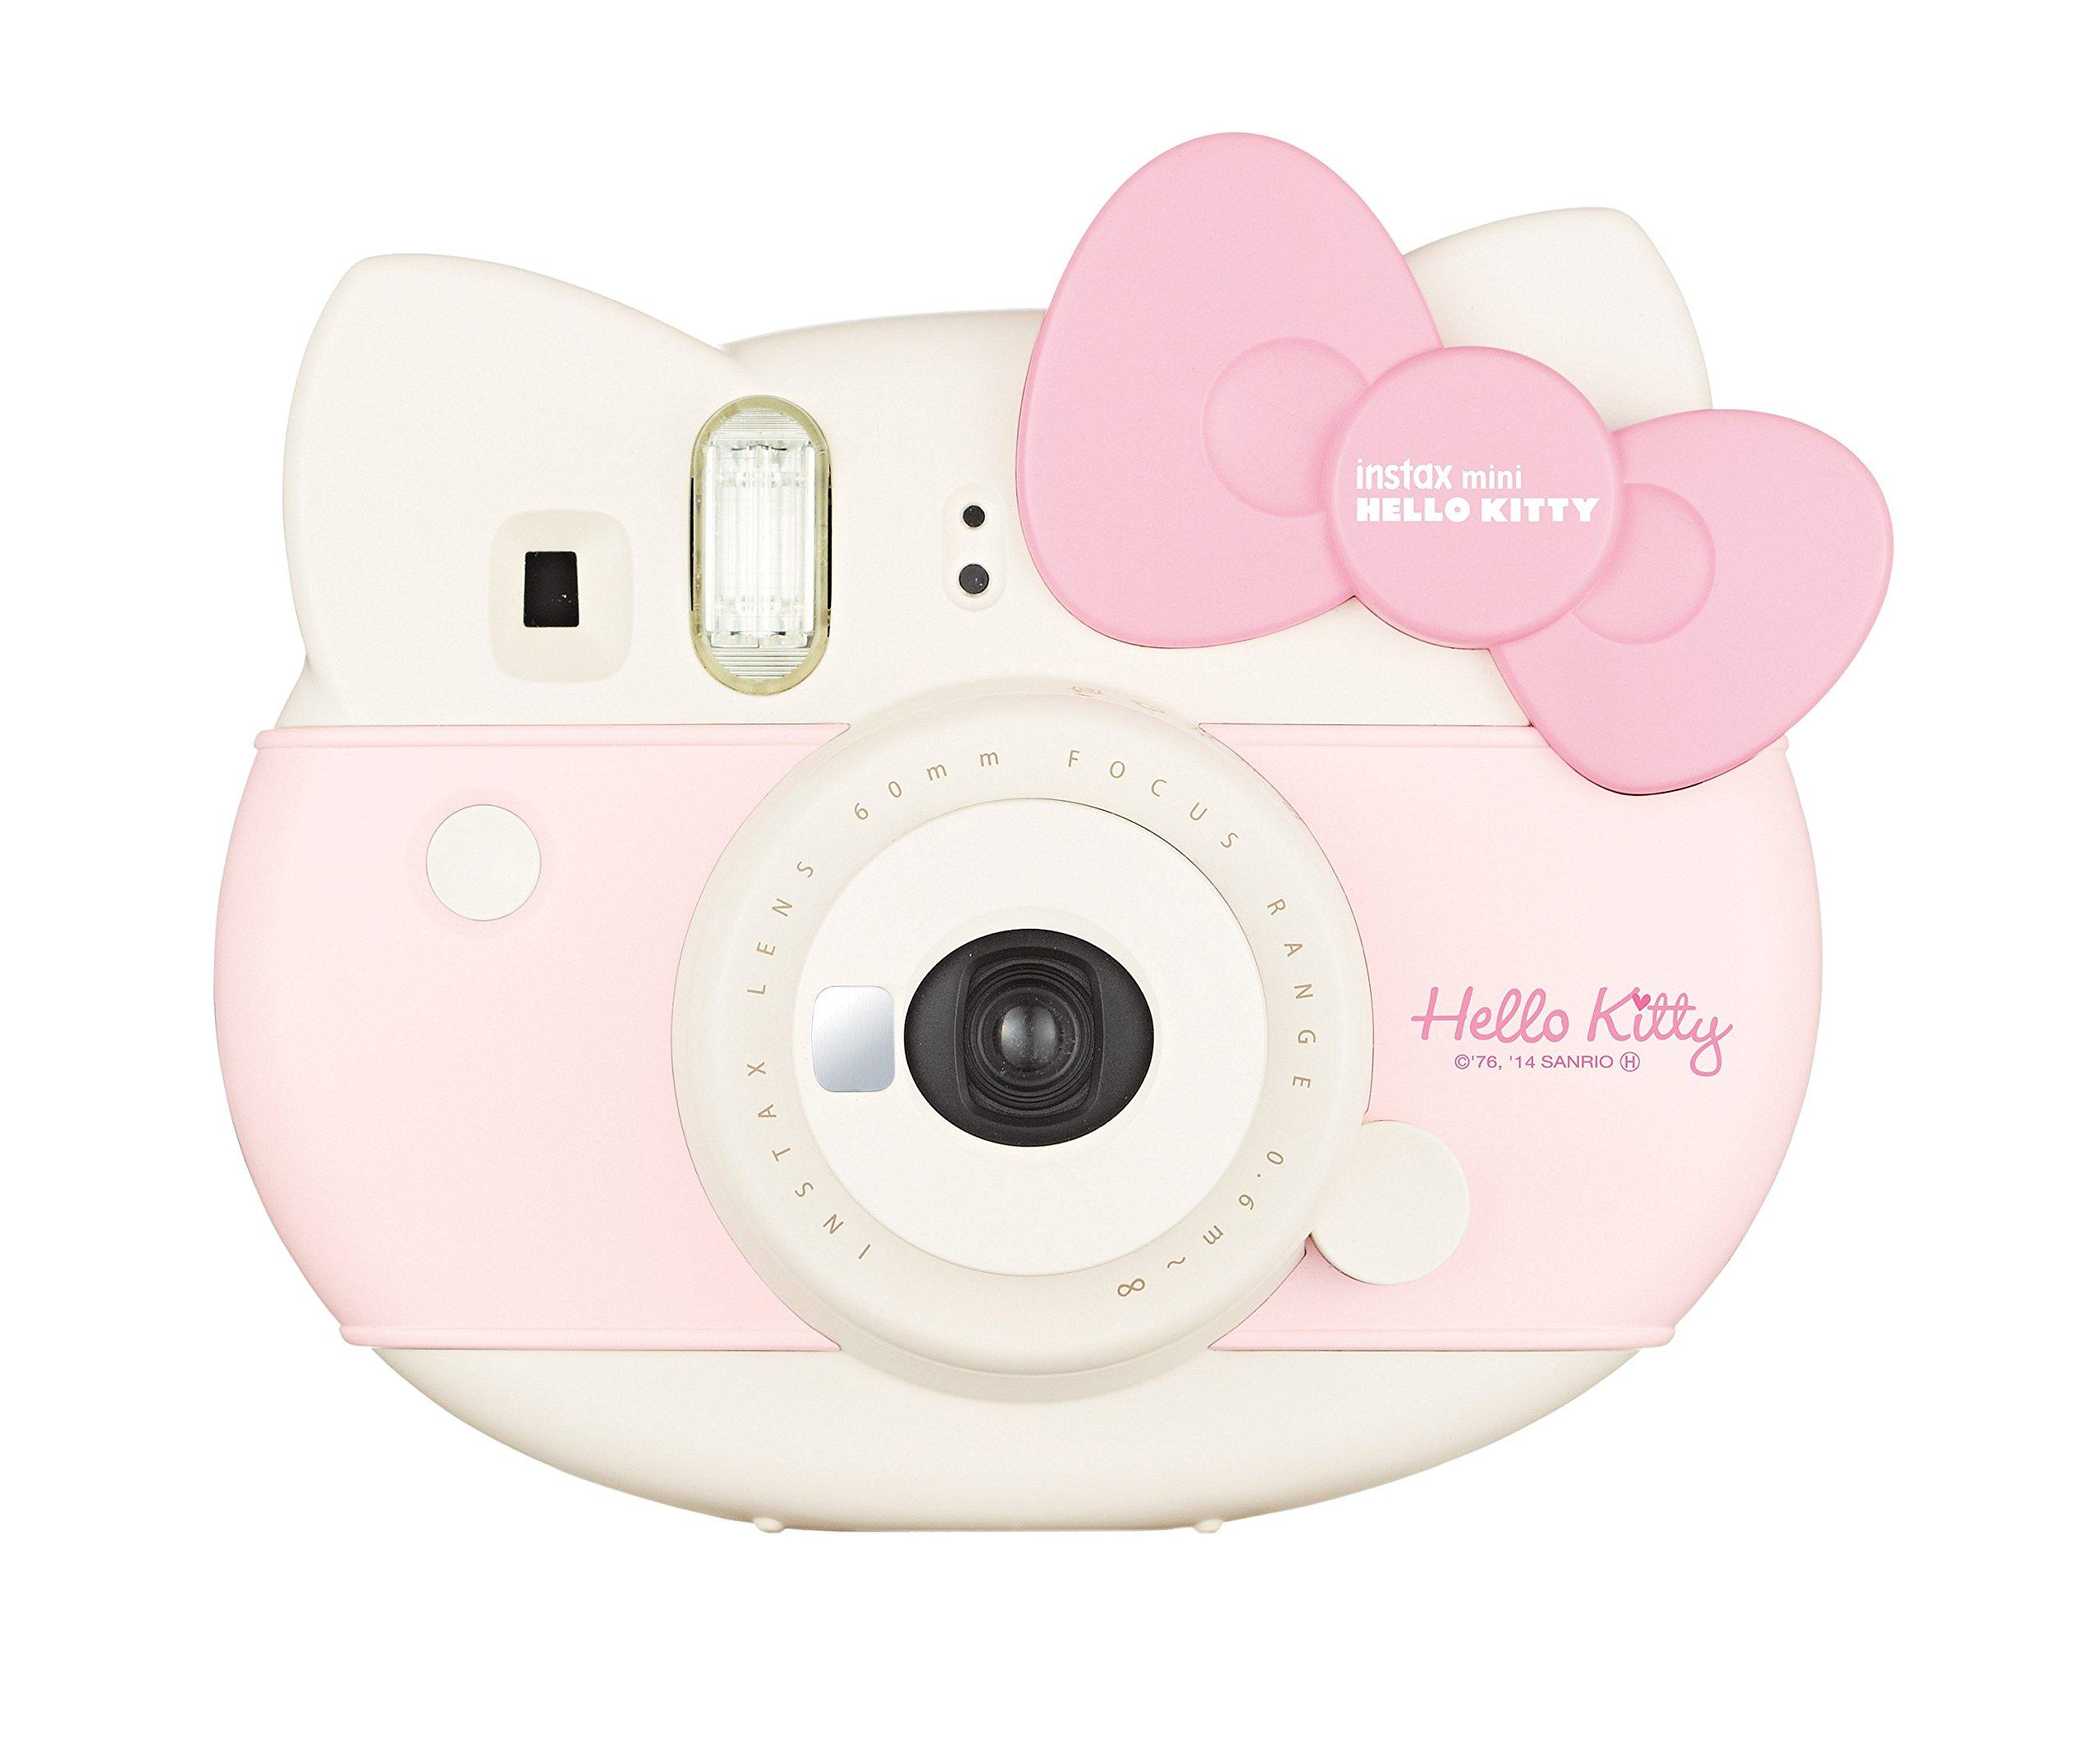 Fujifilm Instax Hello Kitty Instant Film Camera (Pink) - International Version by Fujifilm